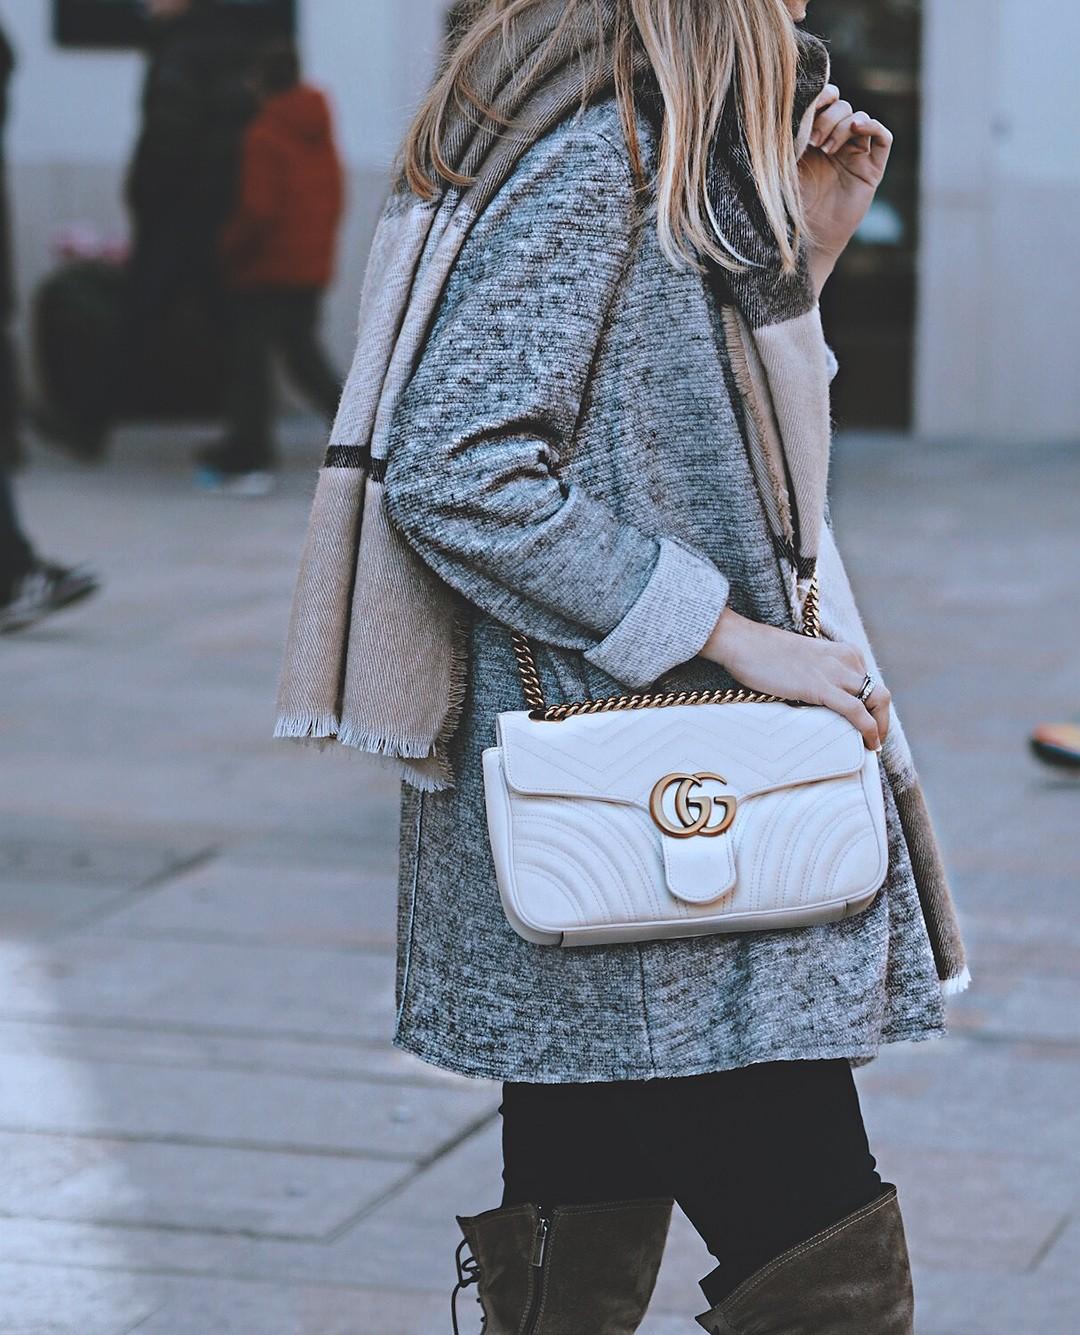 la-roca-village-shopping-day-couple-fashion-blog-barcelona-2017img_5179